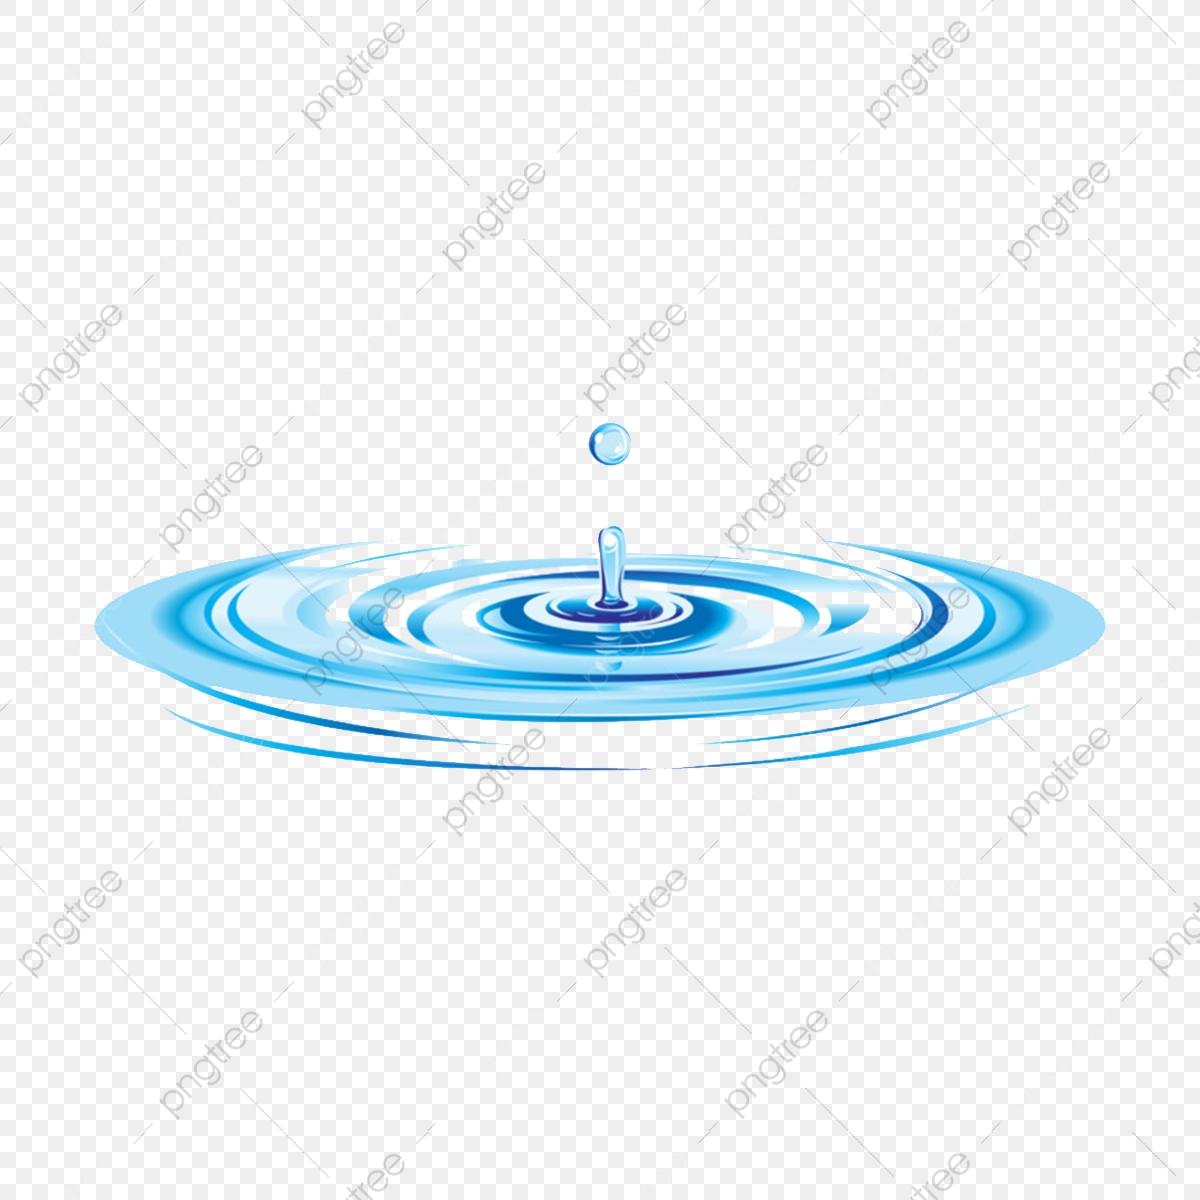 Water Ripple, Blue Water Ripple, Transparent Water Ripple.